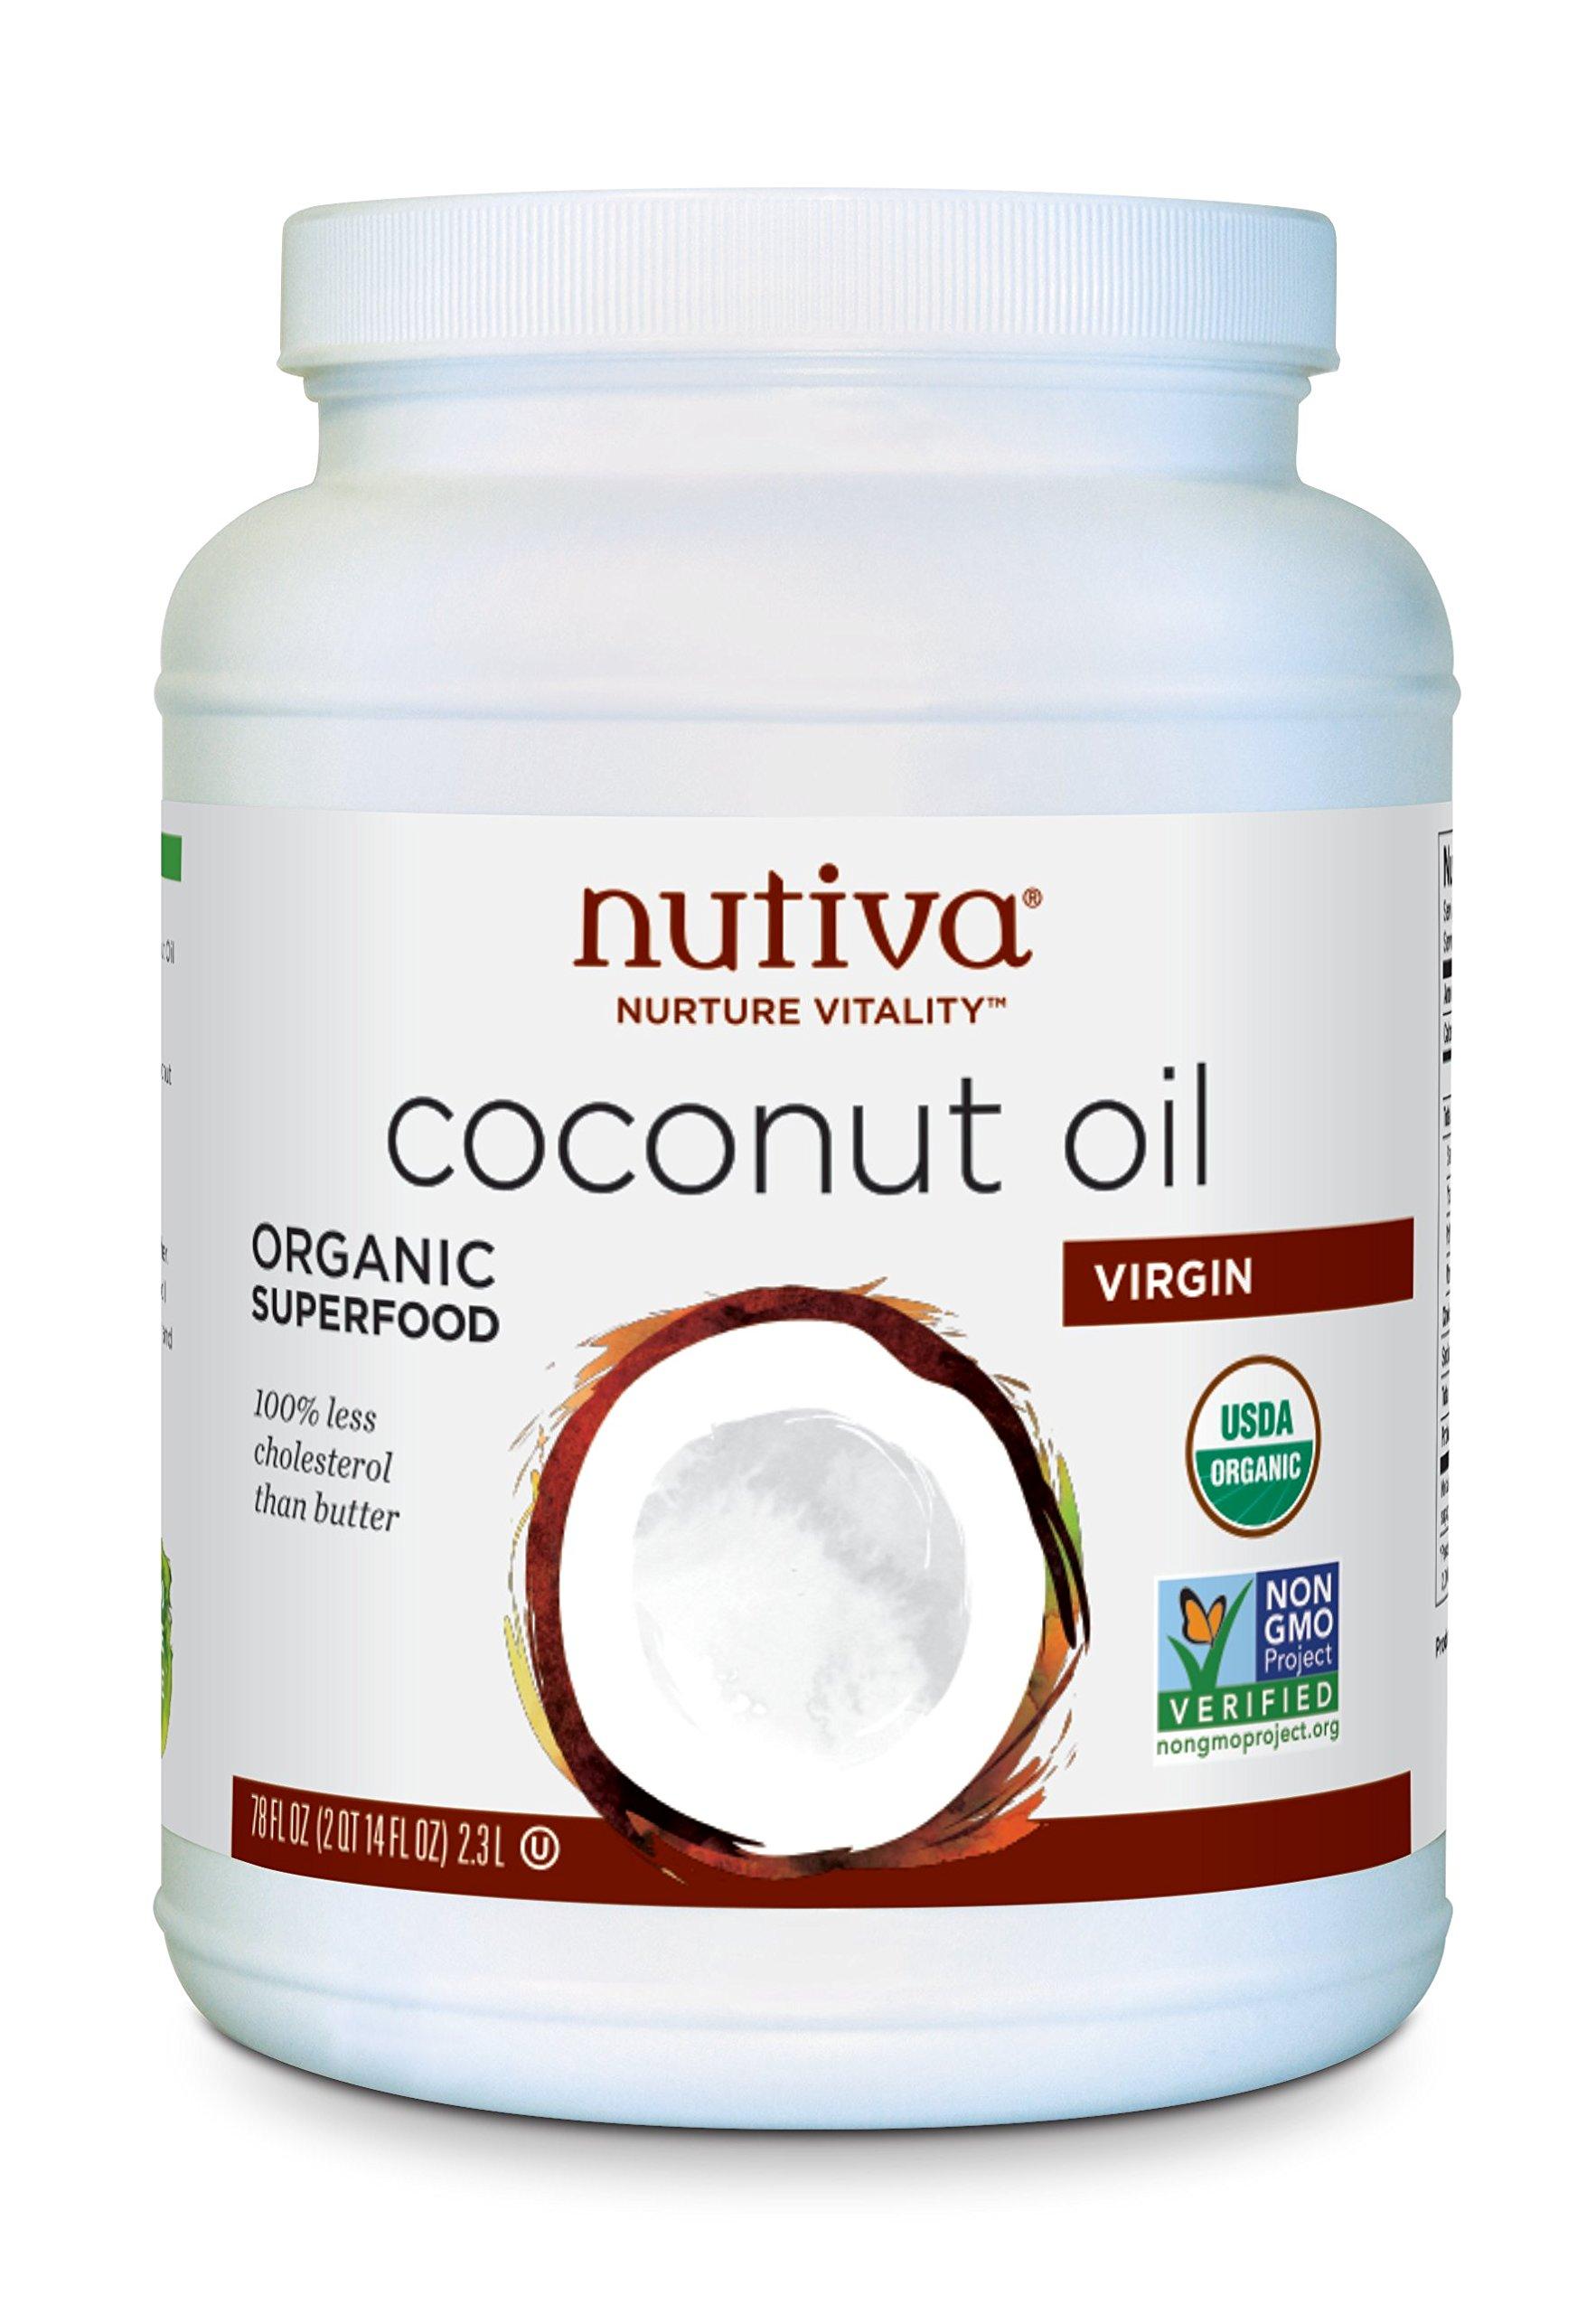 Nutiva Organic, Unrefined, Virgin Coconut Oil, 78 Fl Oz (Pack of 1) by Nutiva